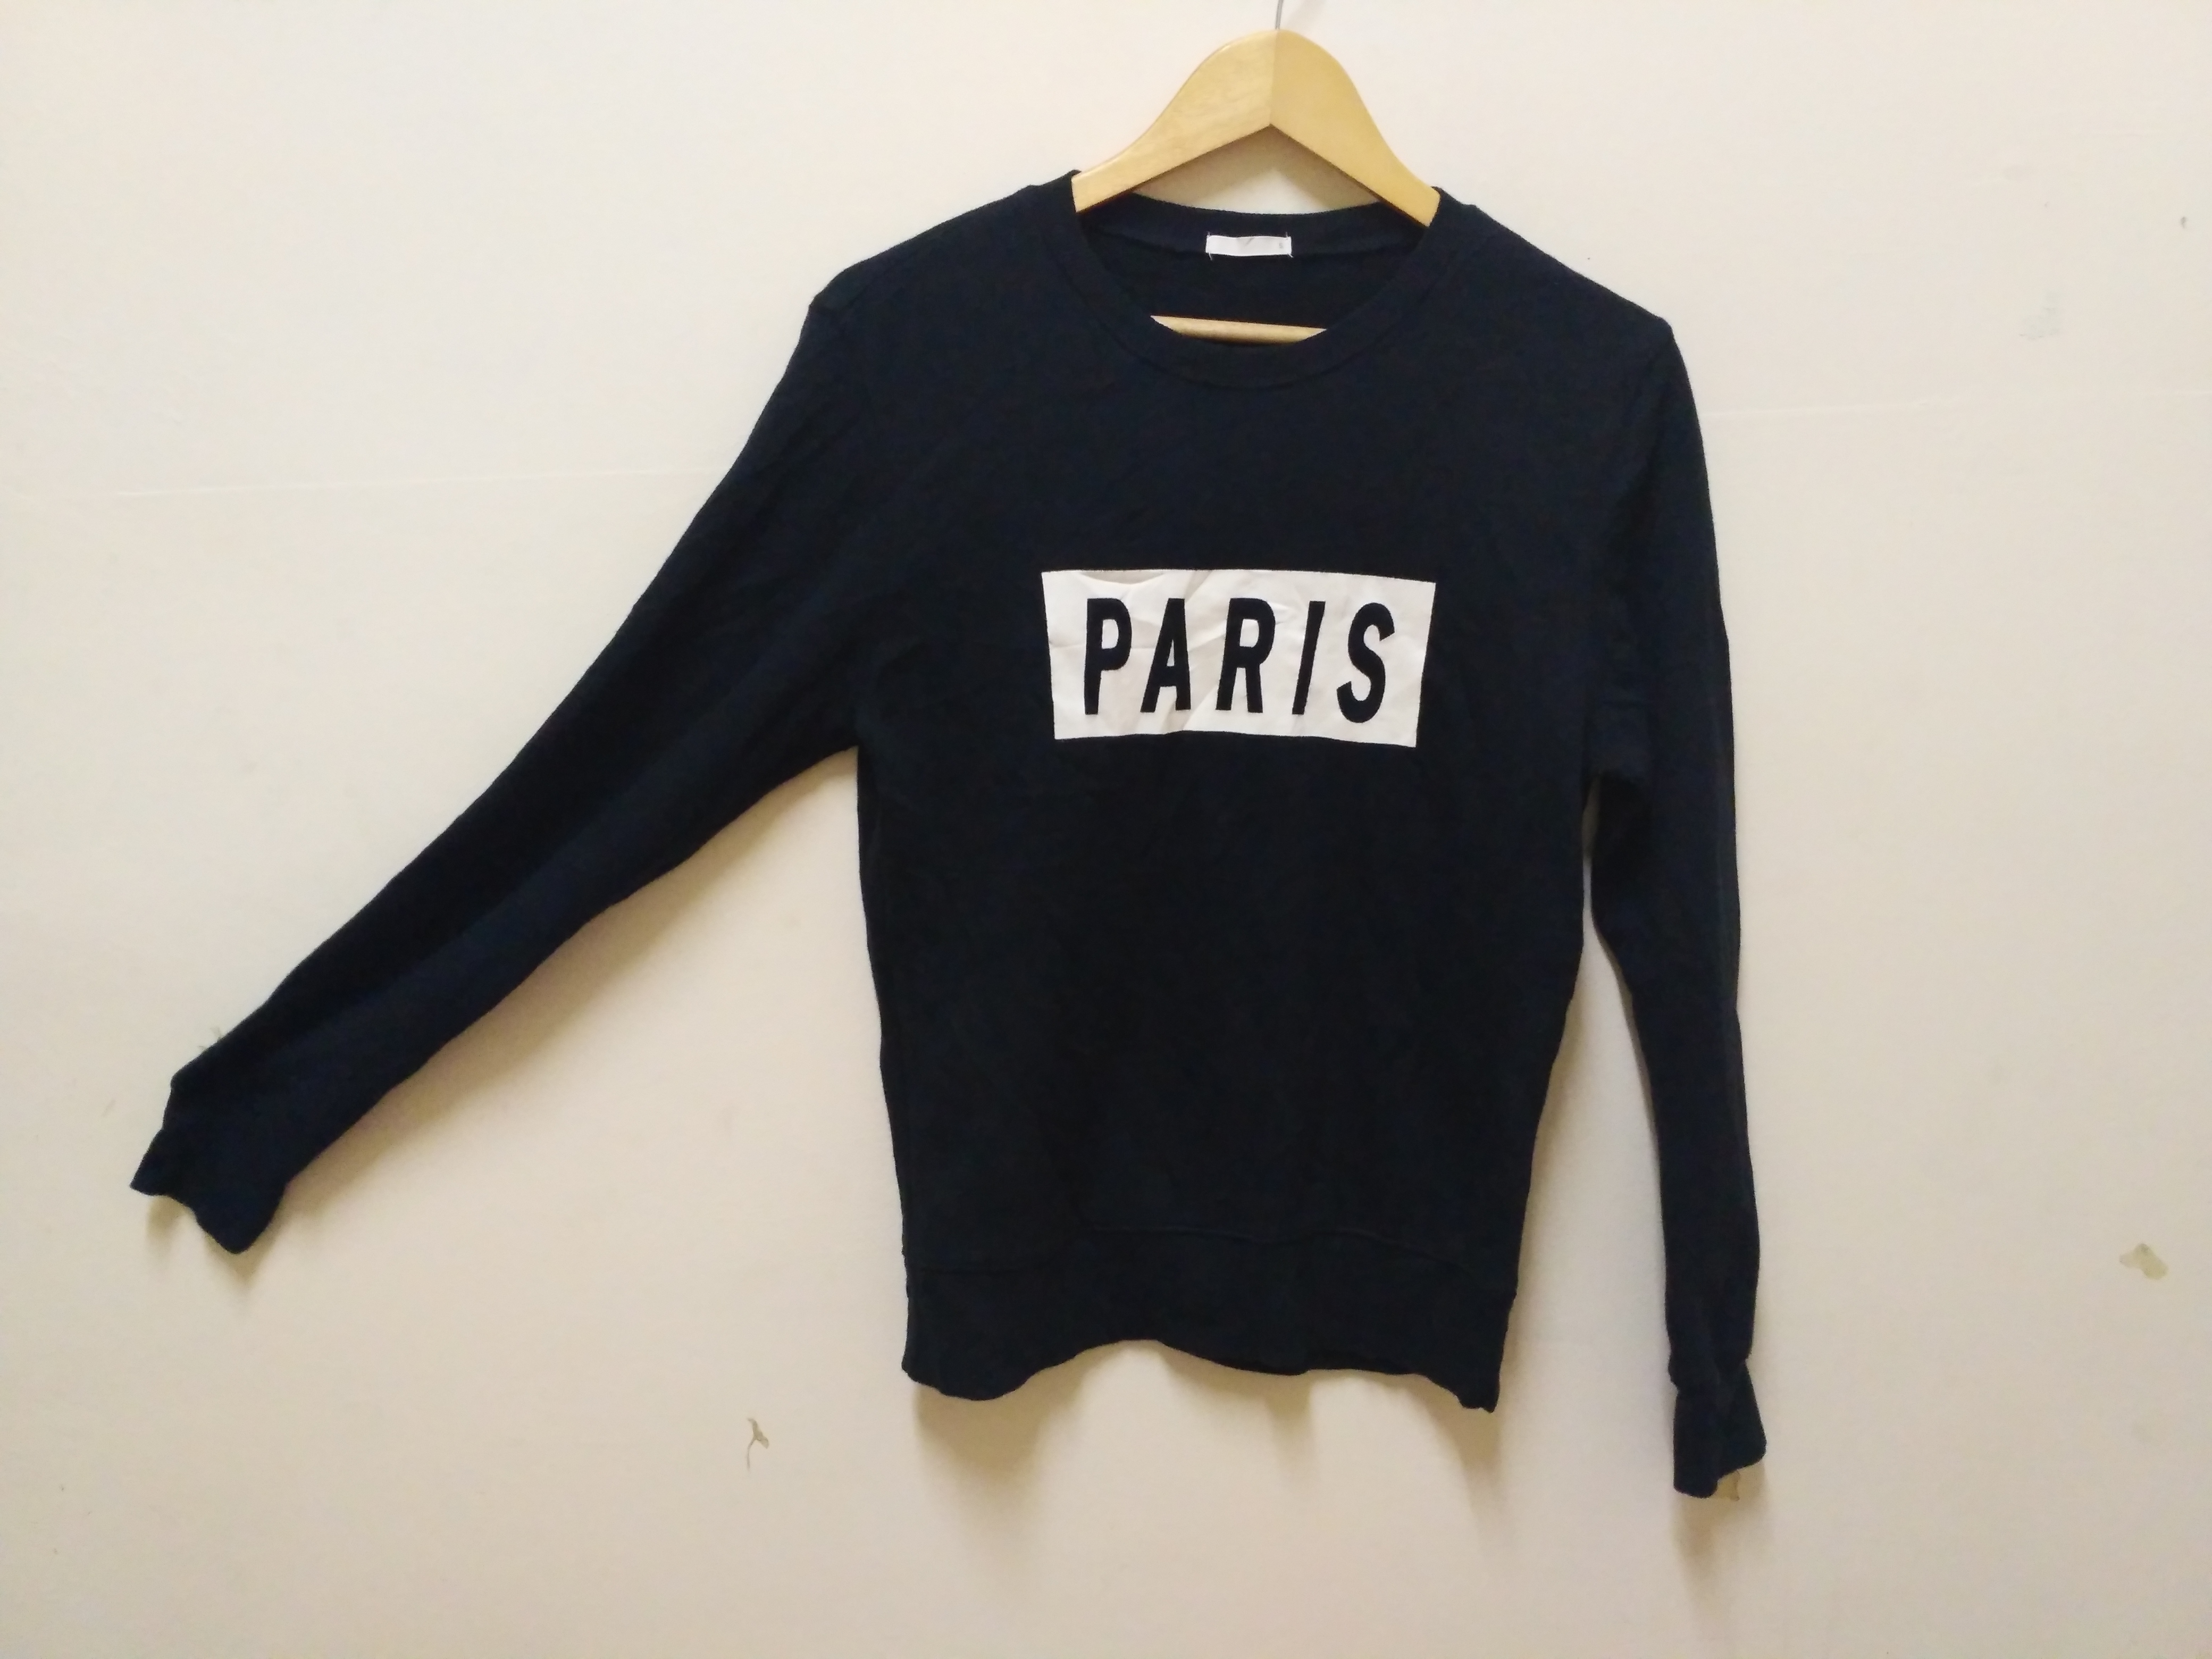 b1d71c8a6dad Paris Box sweatshirt pullover big logo vintage hip hop